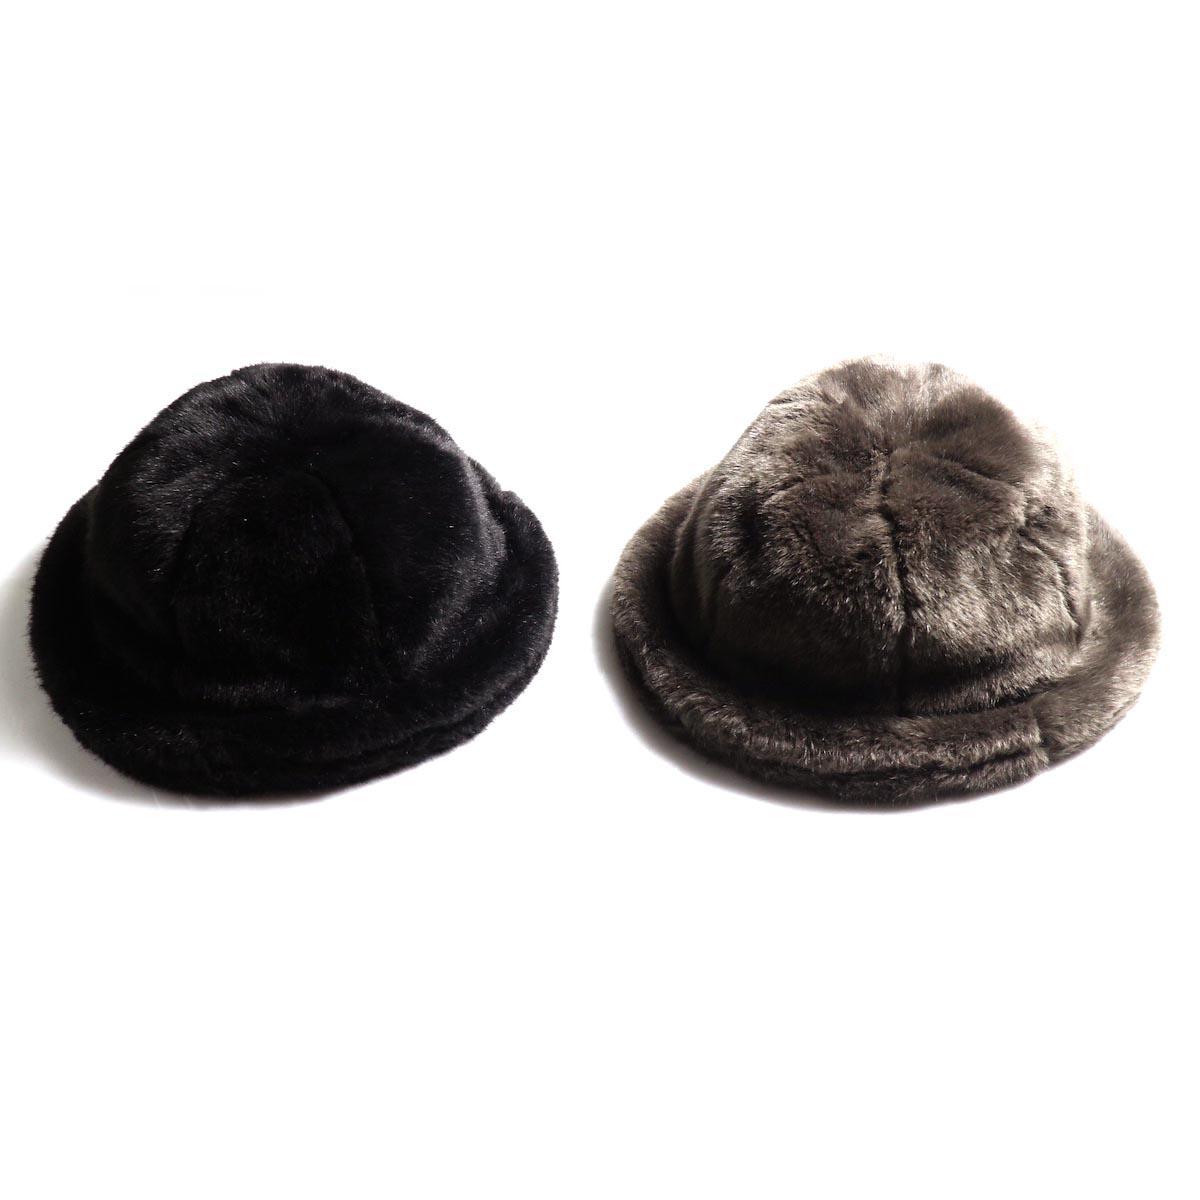 KIJIMA TAKAYUKI / Damage Knit Cap (KN182909)KIJIMA TAKAYUKI / Fake Fur 6 Panel Hat (No.182926)